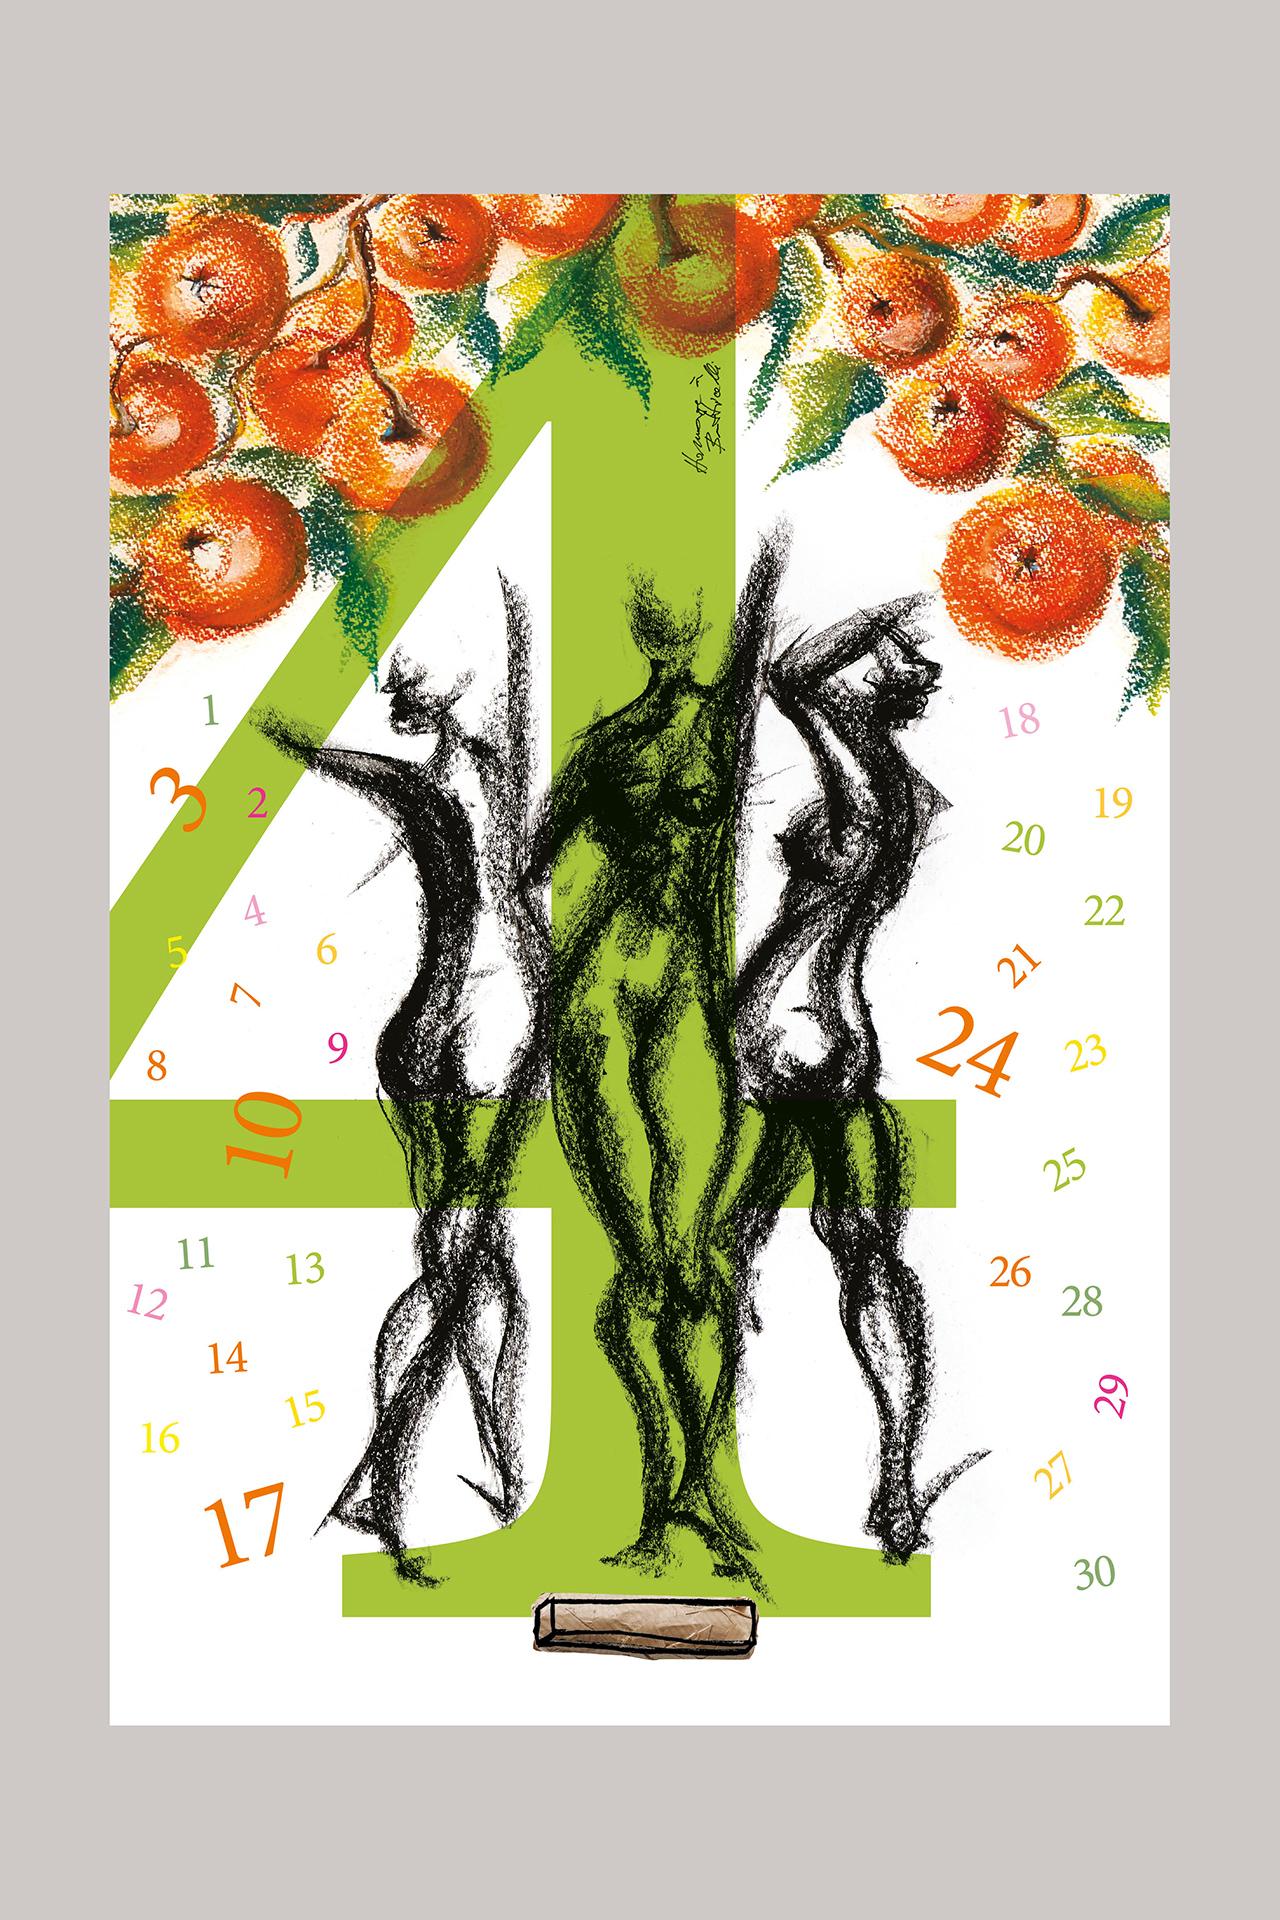 razstava_mio_calendario_16_2